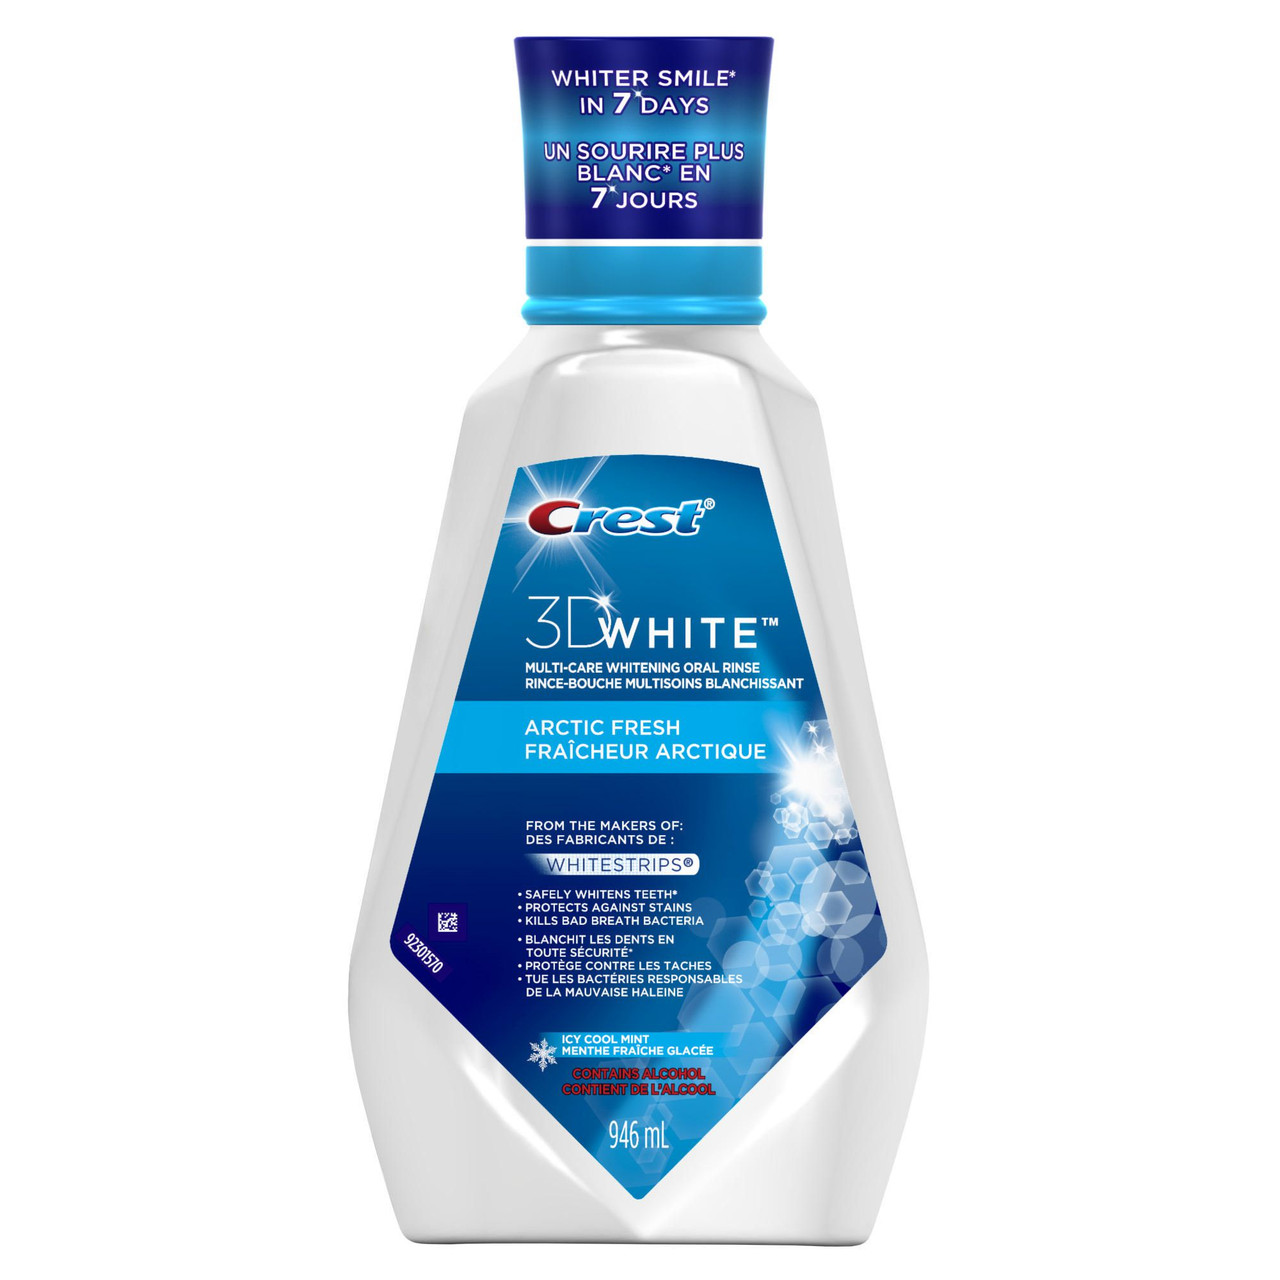 "Crest Mouthwash 3D White Luxe Arctic Fresh Icy Cool Mint- Ополаскиватель ""Ледяная мята"", 946 мл"